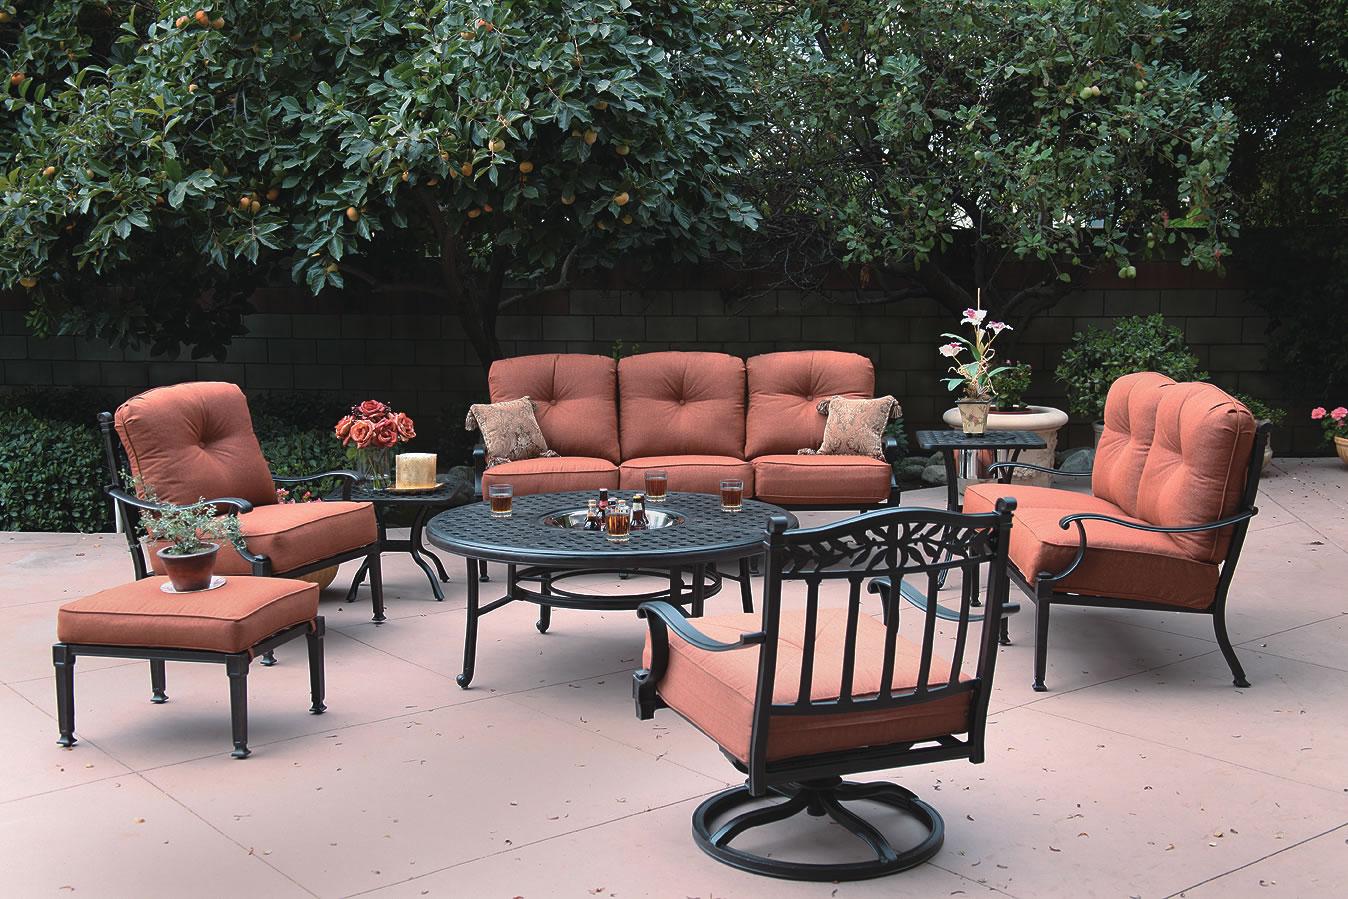 Patio furniture deep seating set cast aluminum 8pc charleston for Deep seating patio furniture